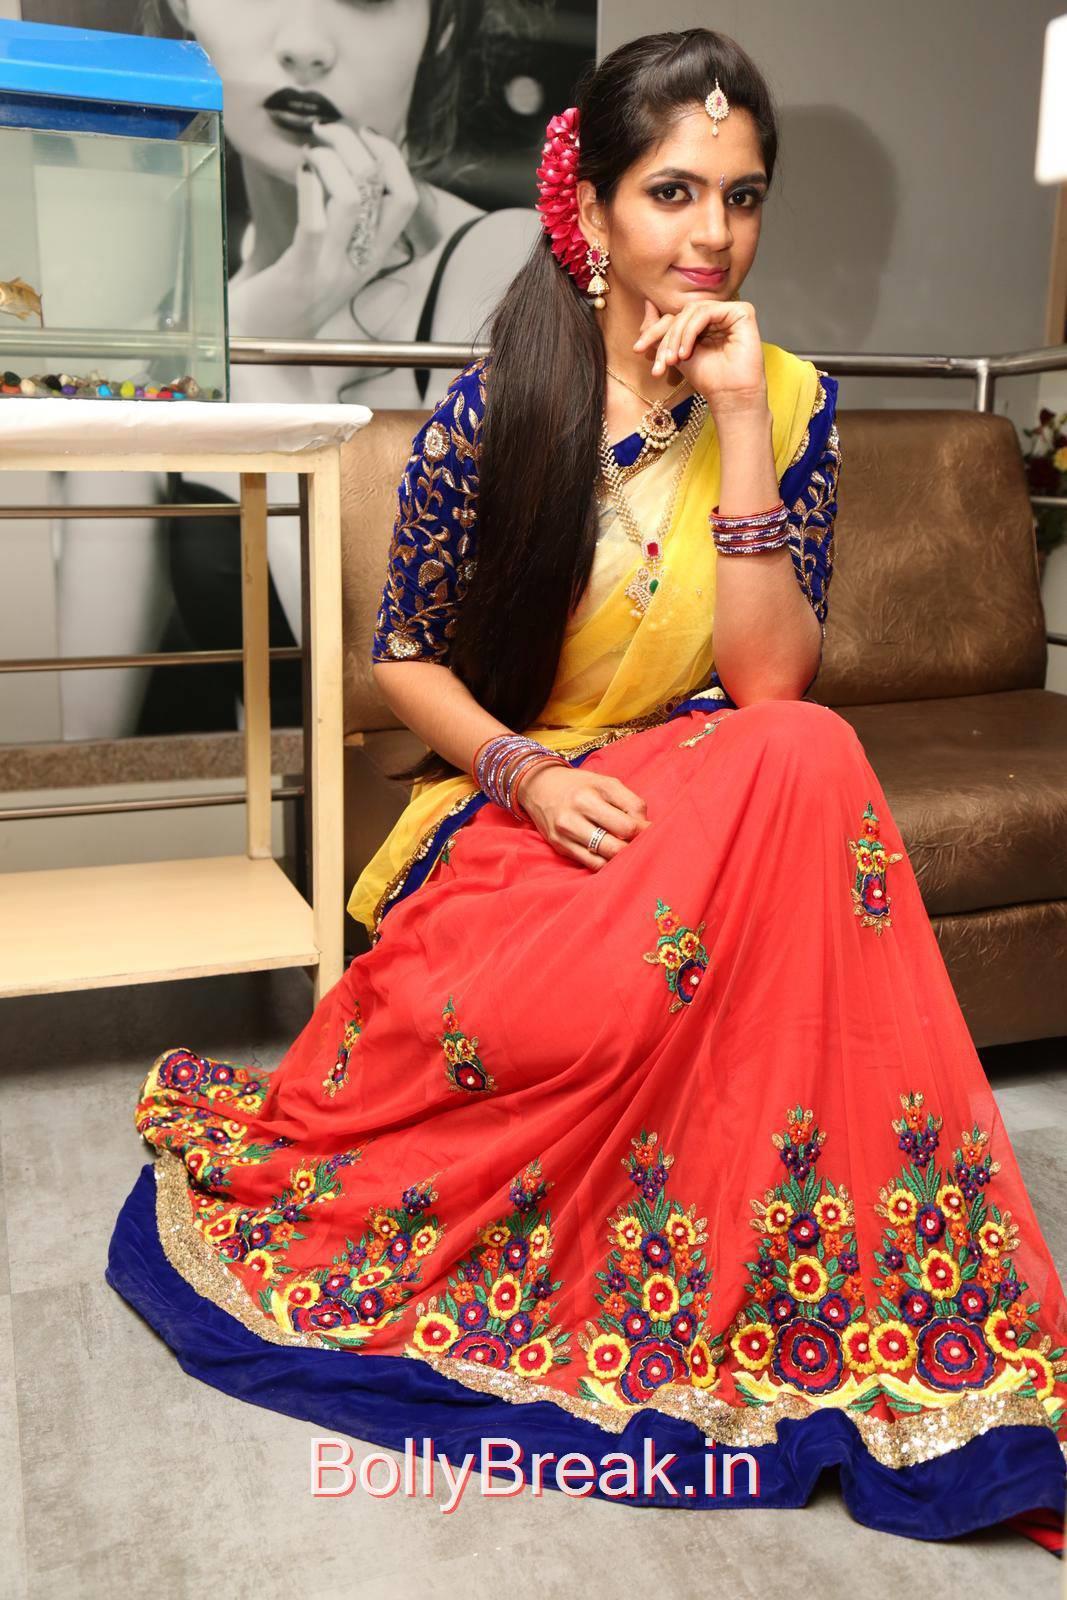 Anusha Photo Gallery with no Watermarks, Anusha Hot Pics from Bridal Dream Make up At Lakme Salon